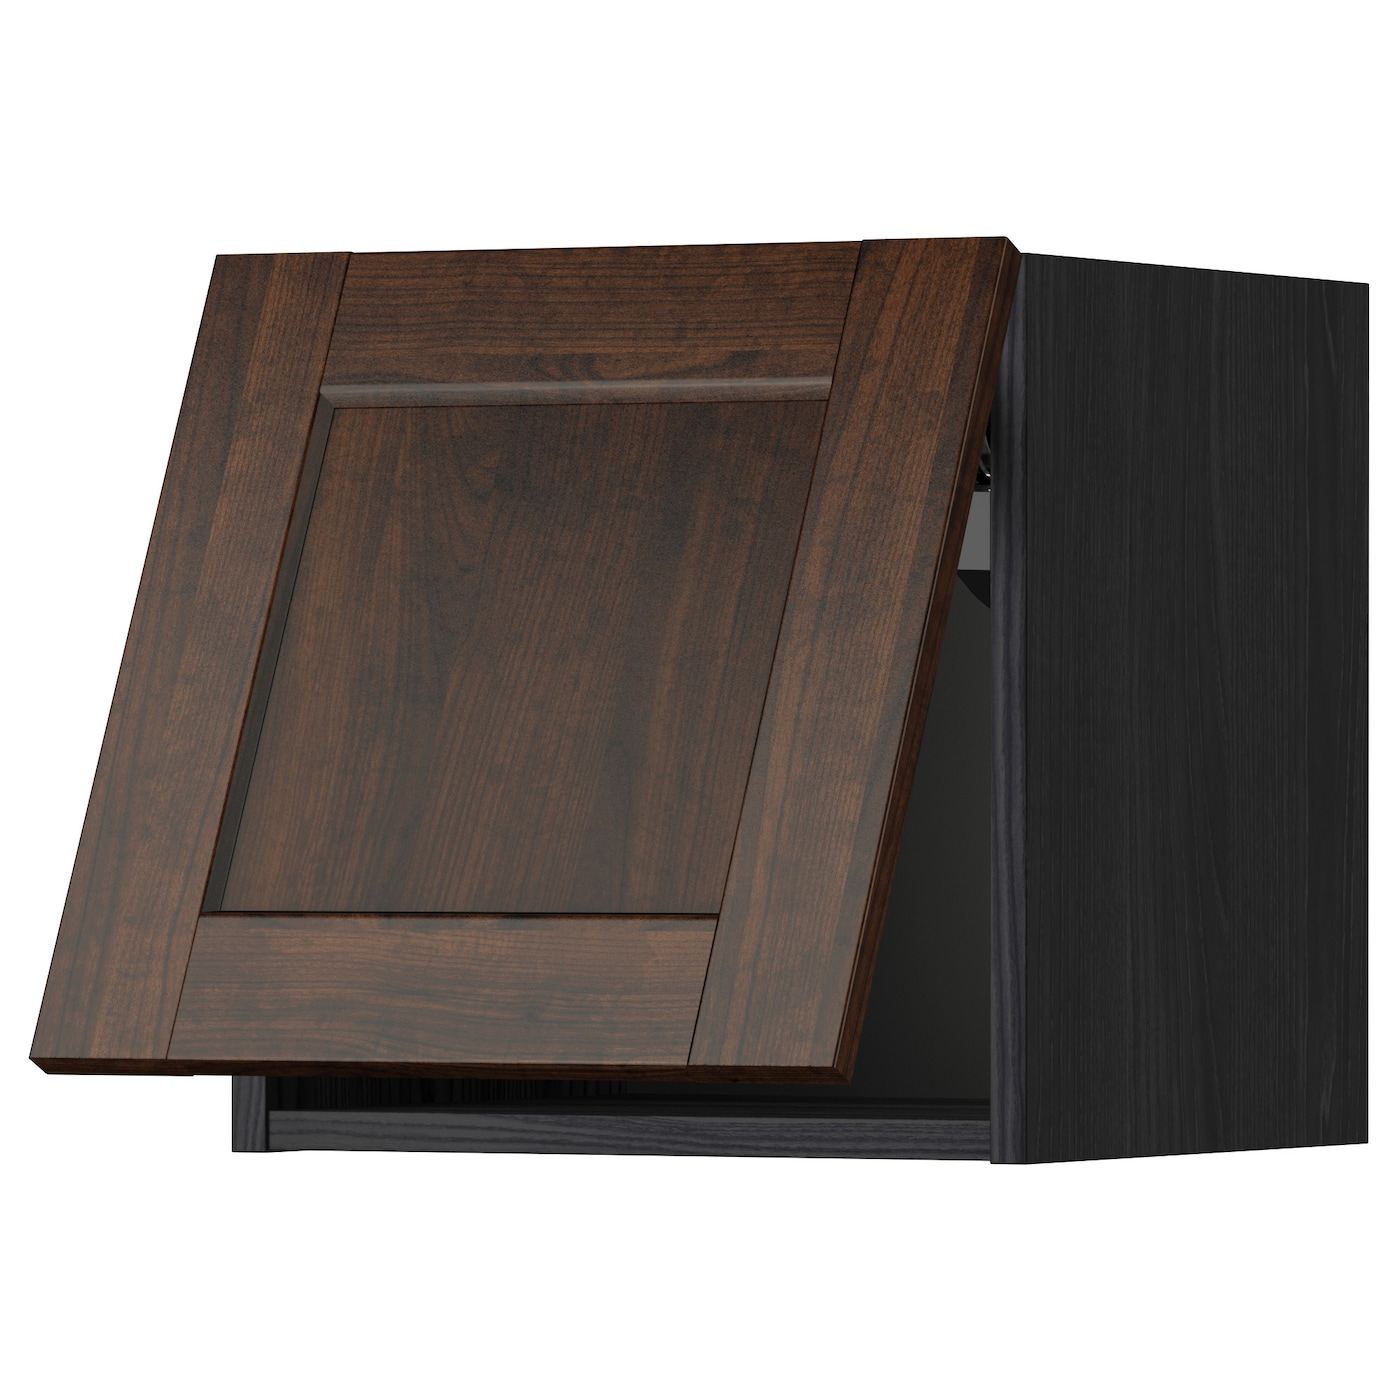 METOD Wall Cabinet Horizontal Black/edserum Brown 40x40 Cm